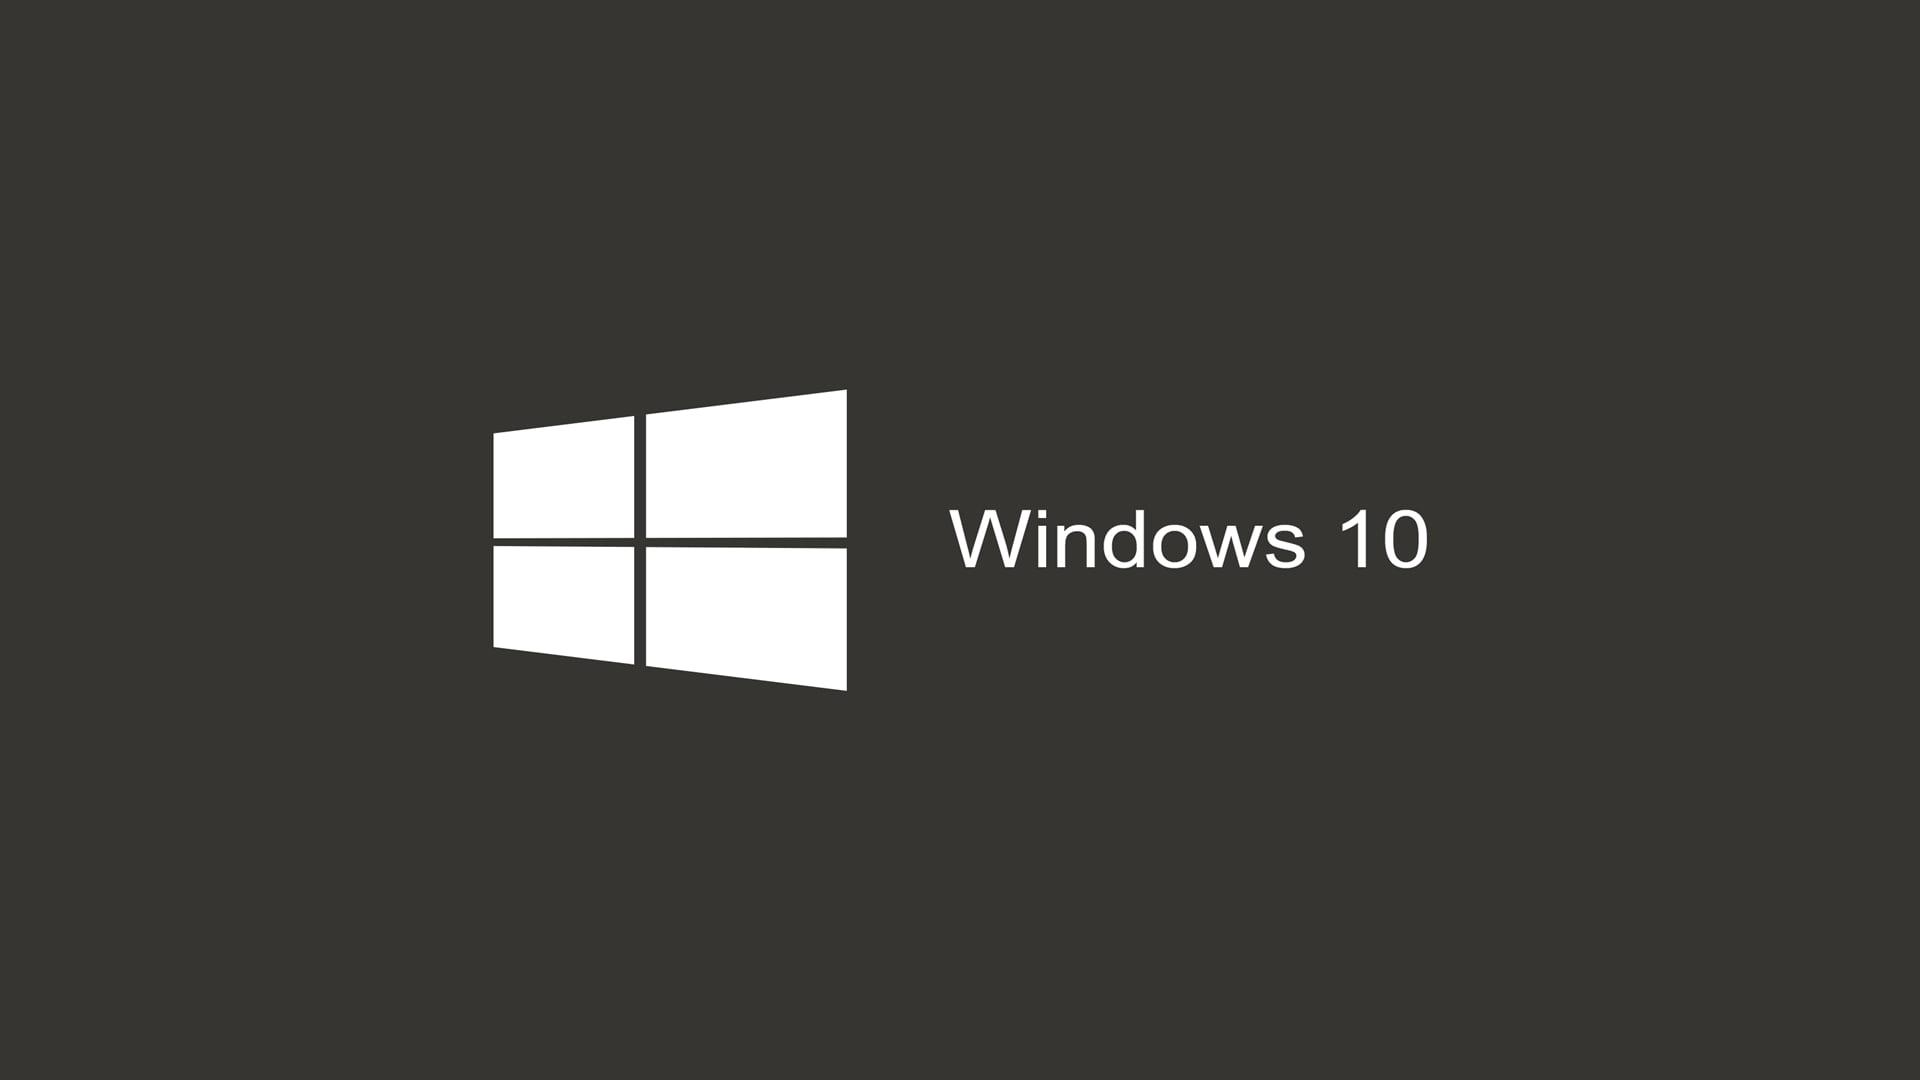 Papéis de parede do Windows 10 4